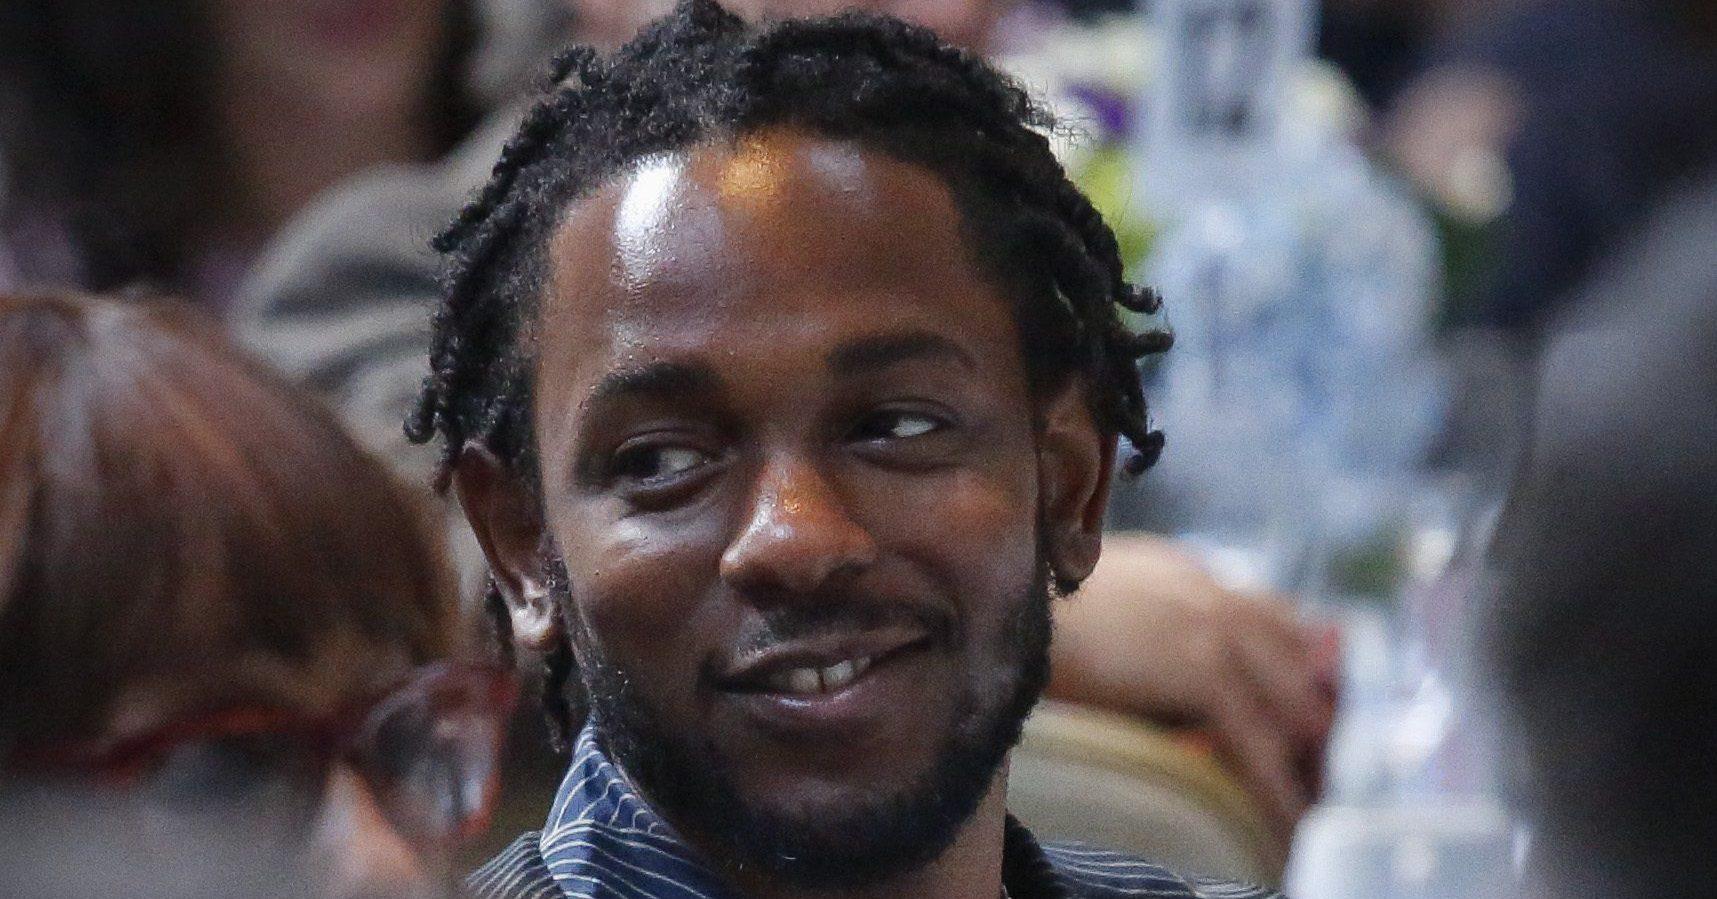 Kendrick Lamar explains why white people shouldn't rap the n-word in his lyrics